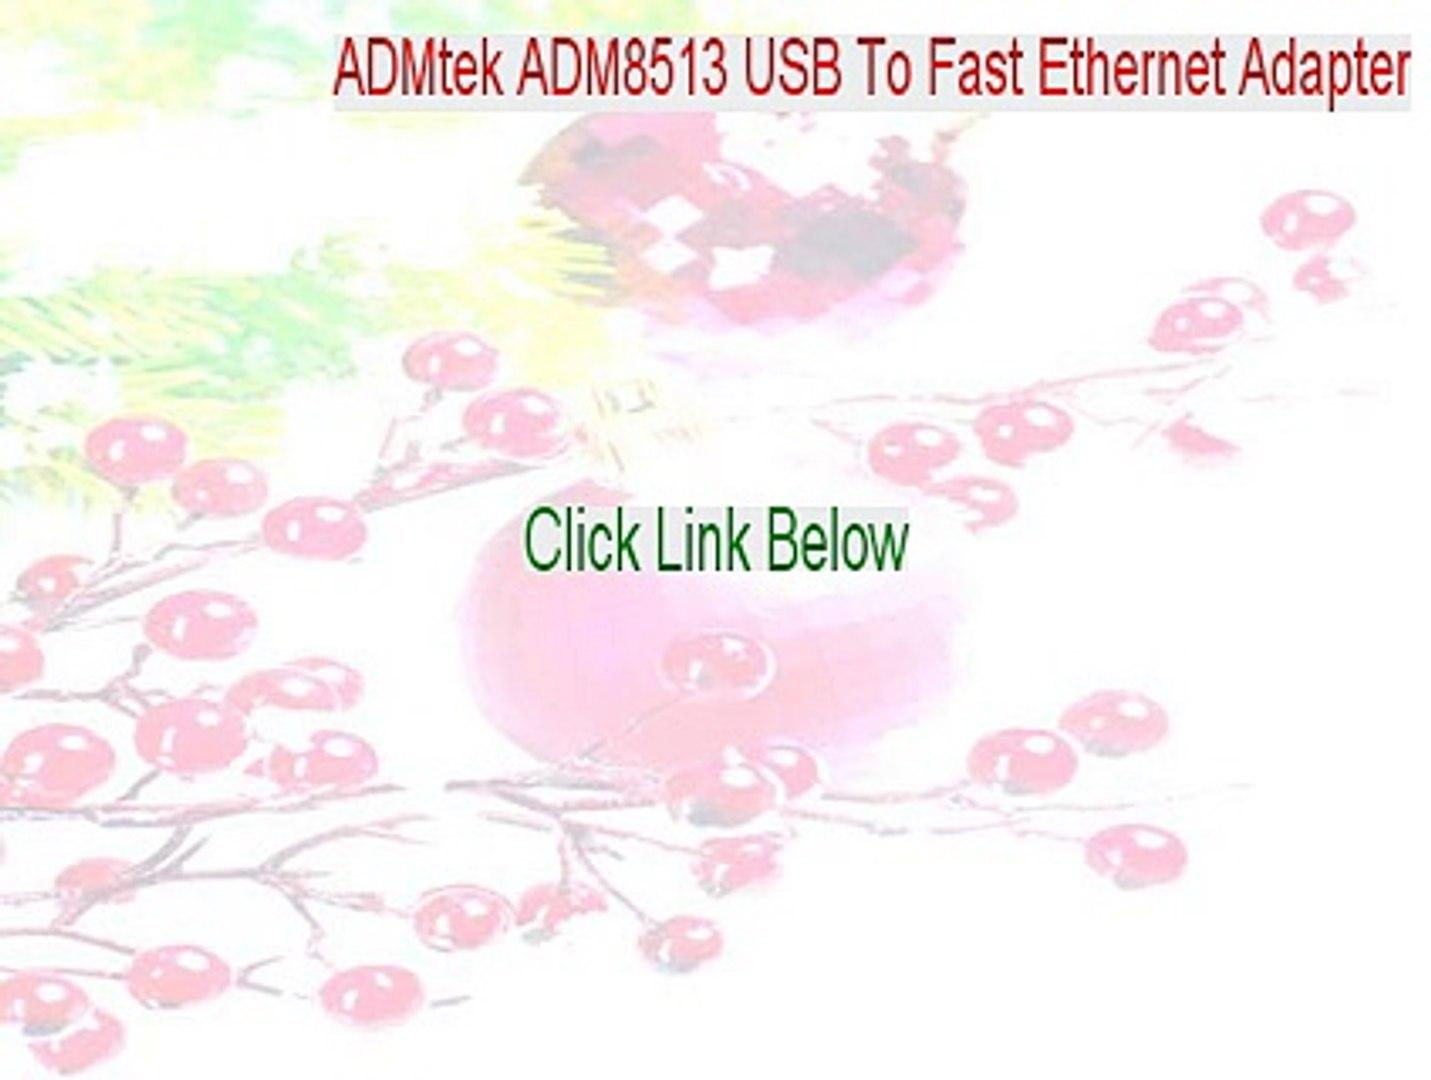 ADMTEK USB 2.0 TO ETHERNET DRIVERS FOR WINDOWS DOWNLOAD